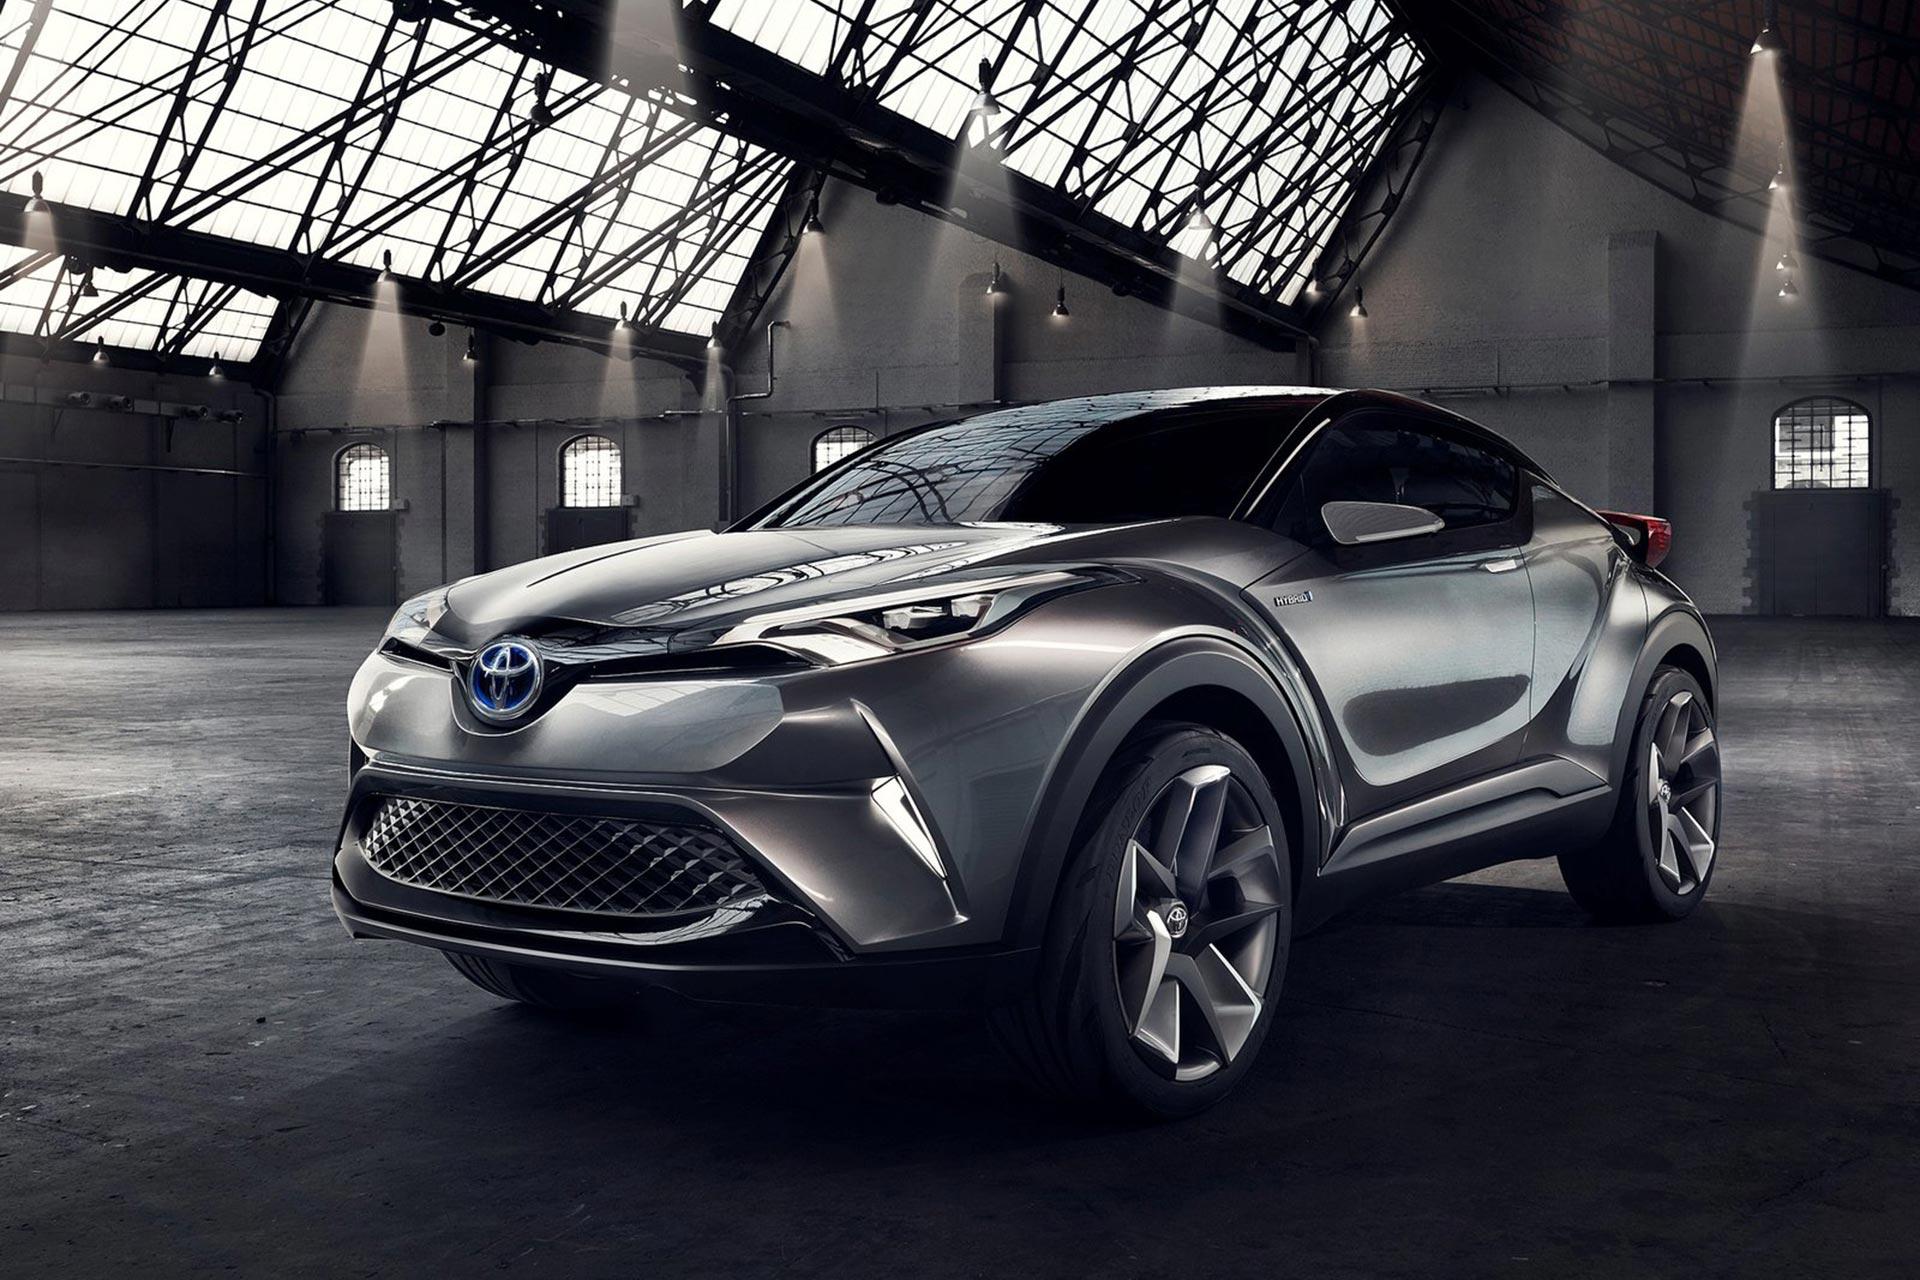 Toyota-C-HR_Concept-2015-1600-02.jpg